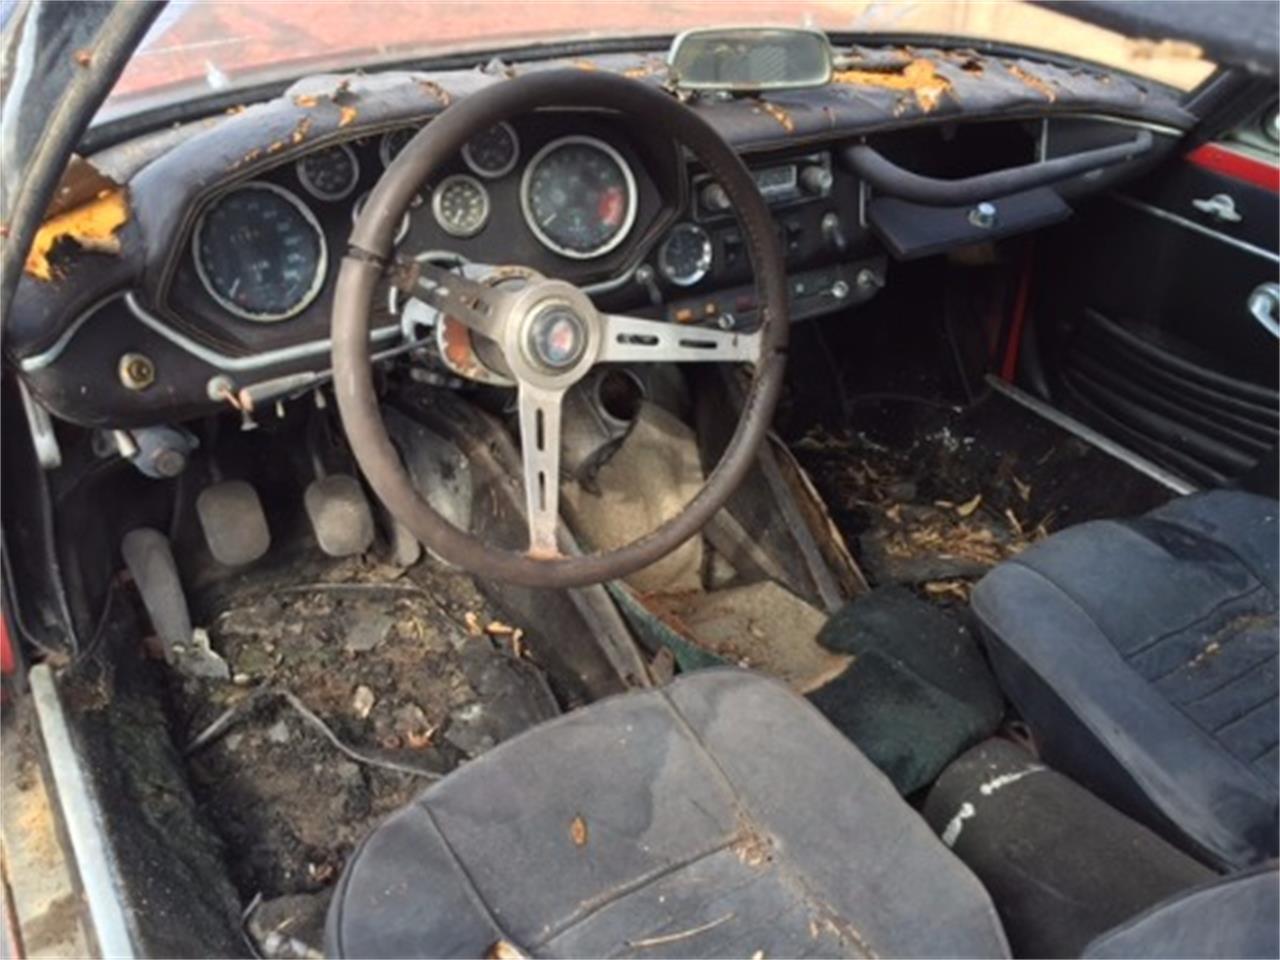 For Sale: 1968 Maserati Mistral in Astoria, New York